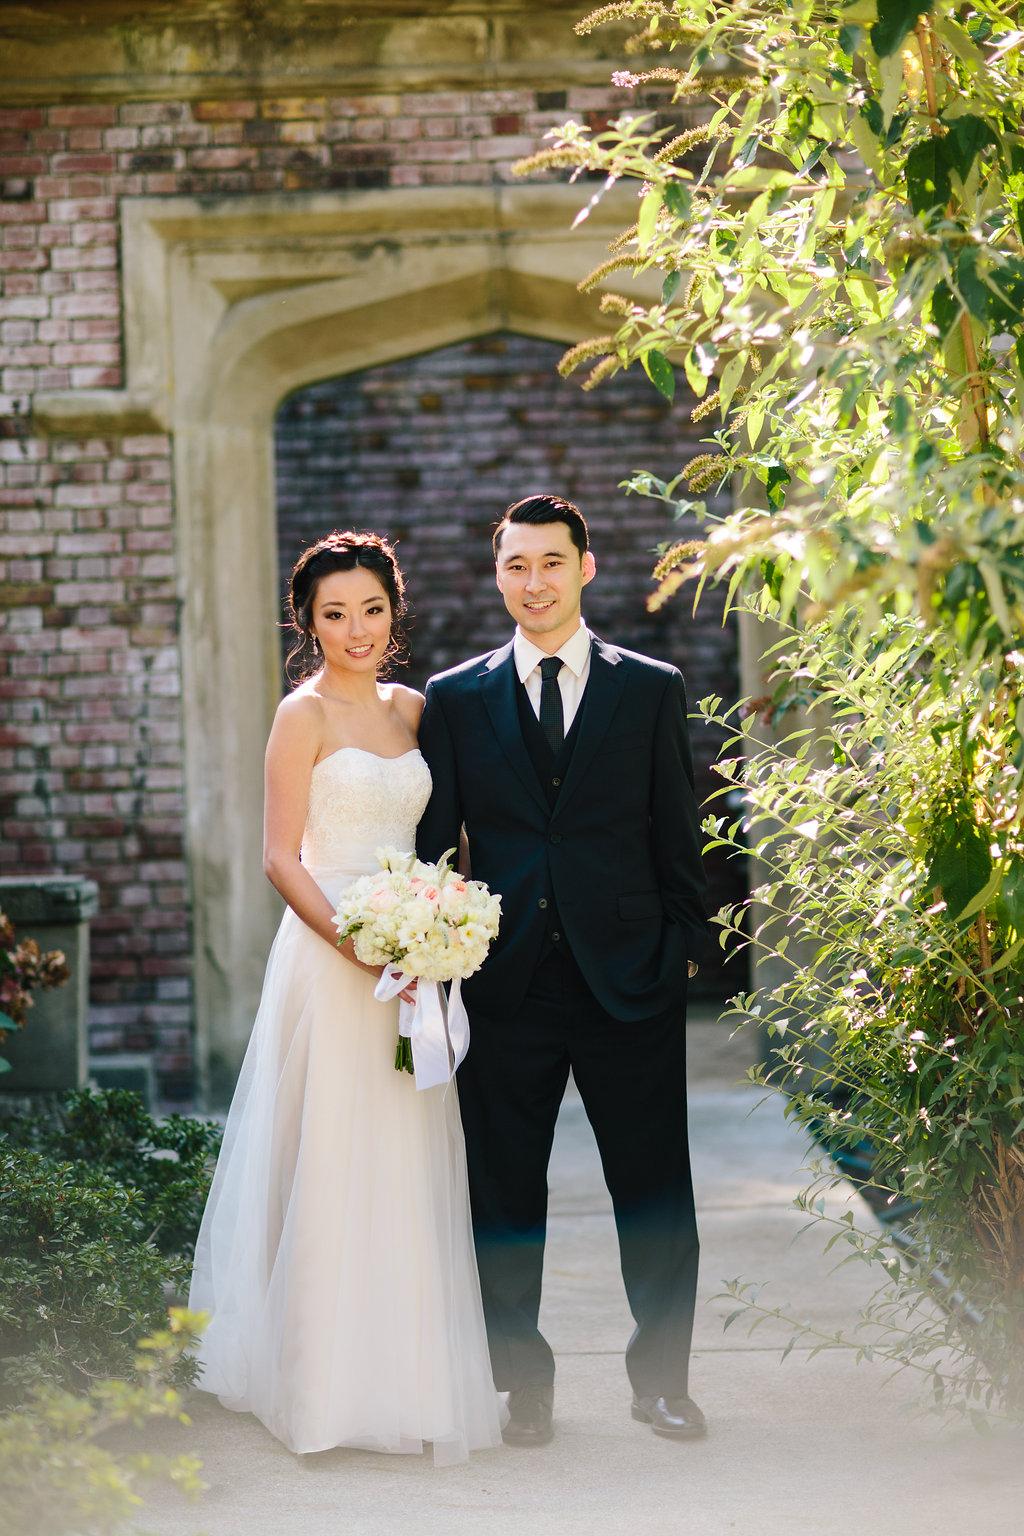 Kellylemonphotography_lucy+kento_weddingpreviews-12.jpg